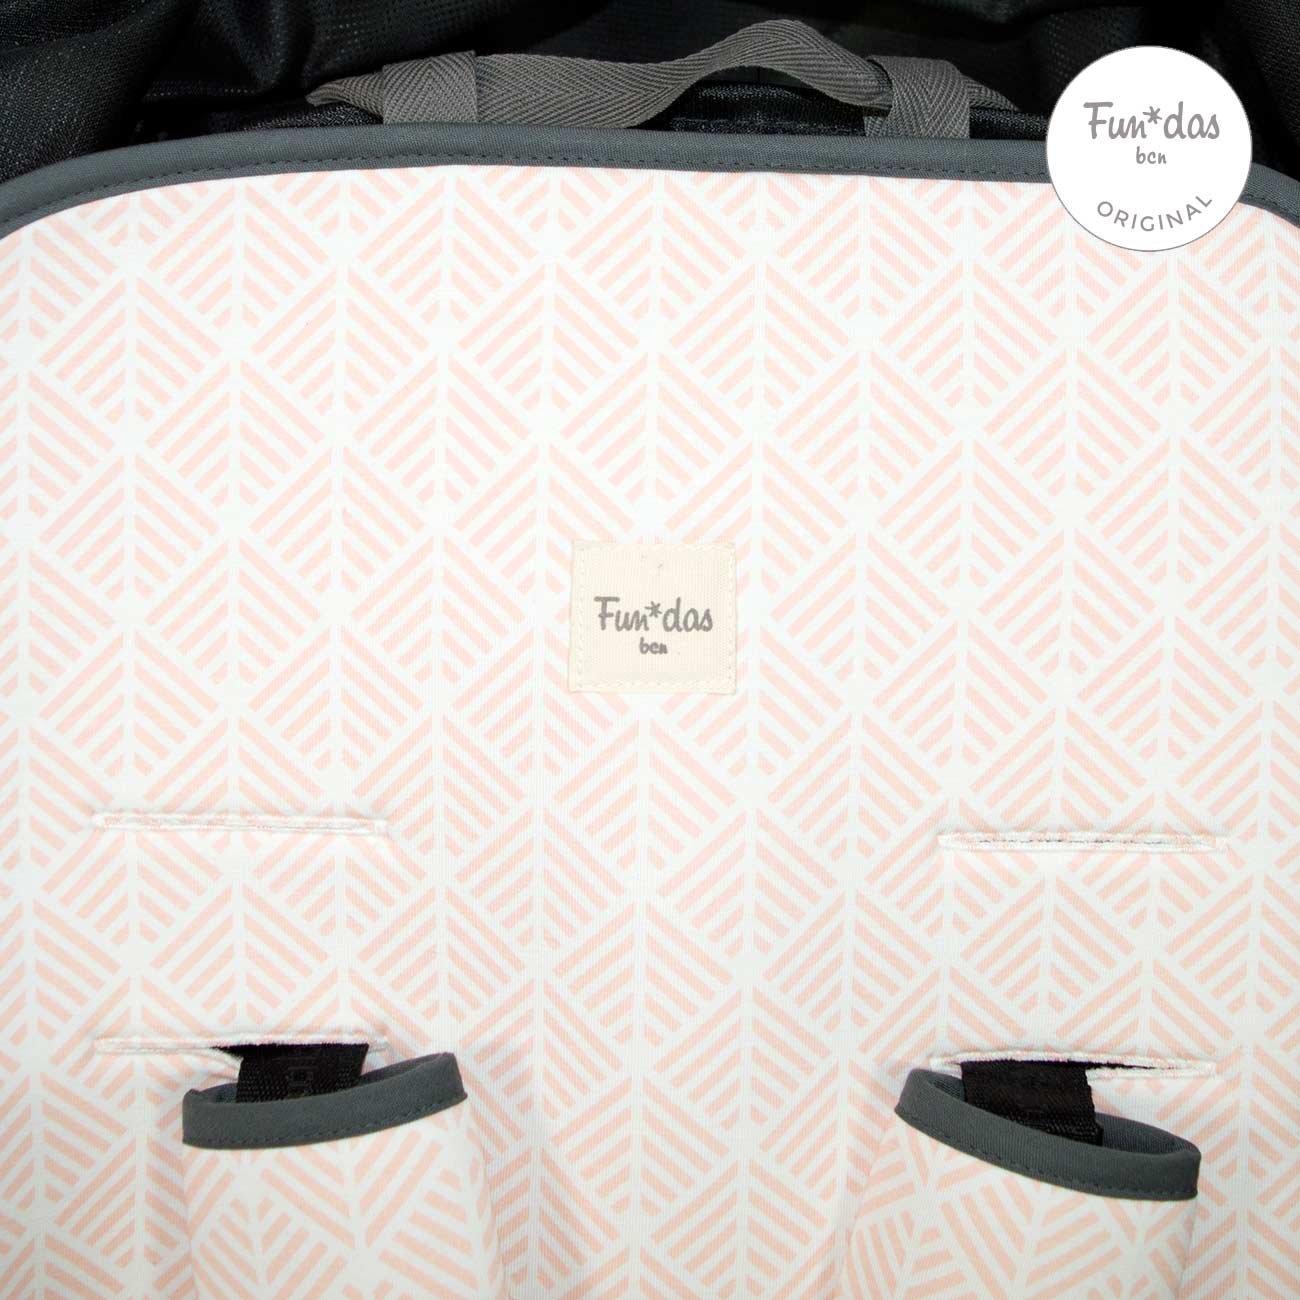 Pink Spike Colchoneta Universal para Silla de Paseo Fundas BCN /® F158